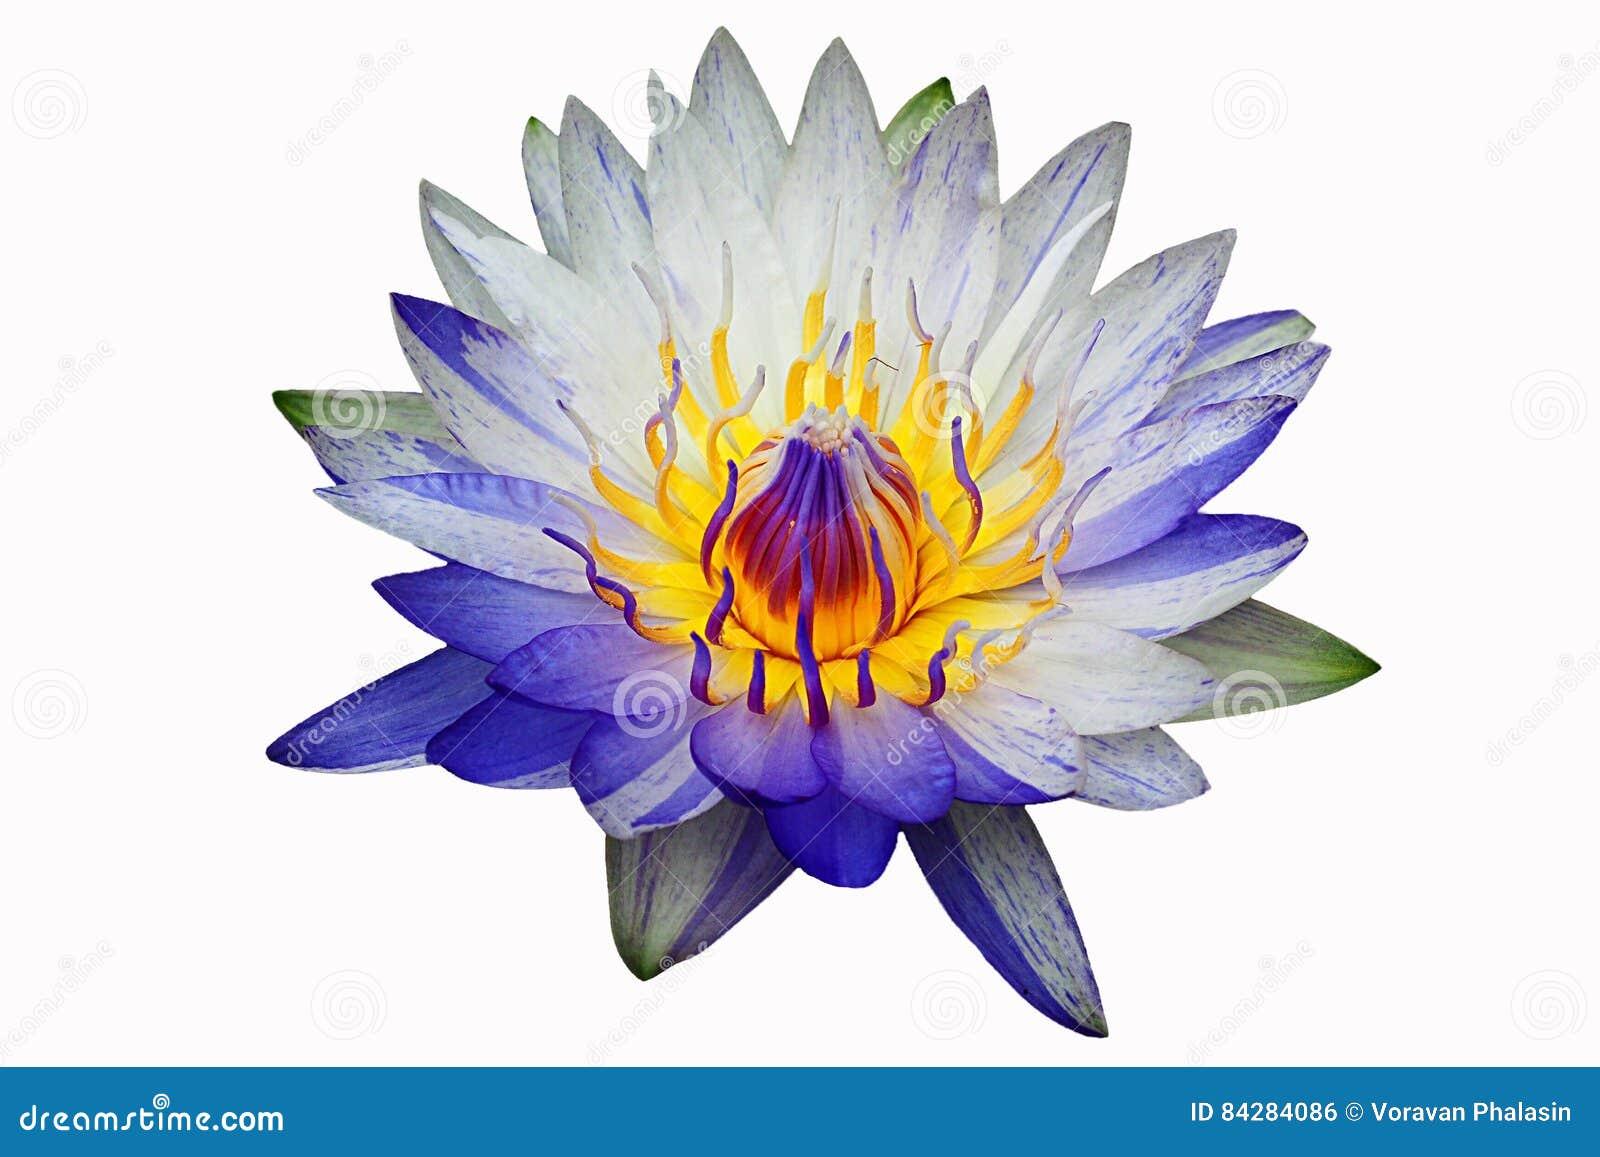 Blue lotus flower white background izmirmasajfo